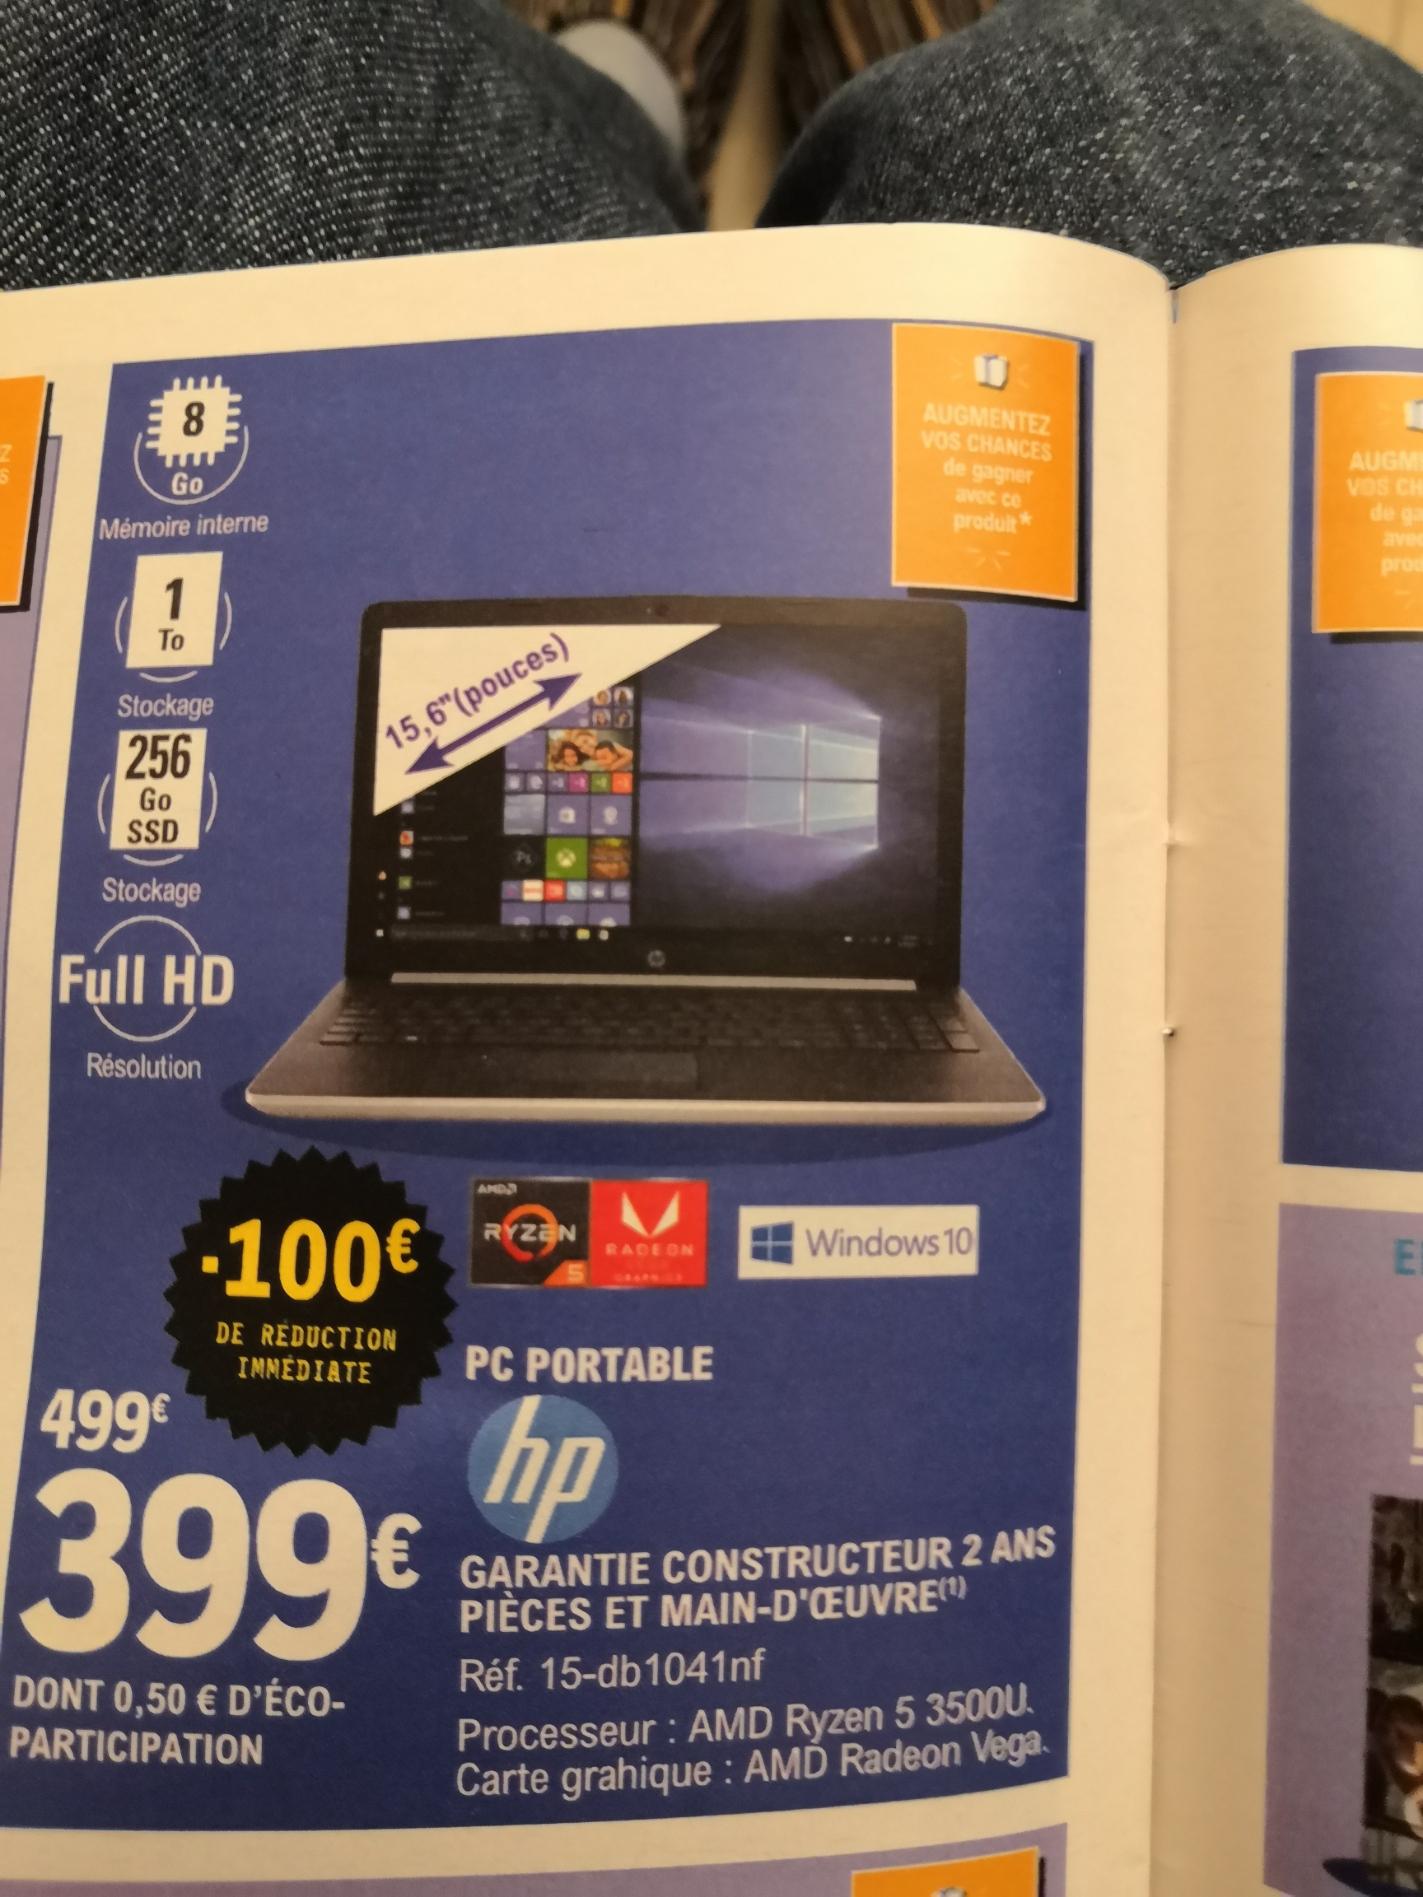 "PC Portable 15,6"" HP 15-db1041nf - Full HD SVA, Ryzen 5 3500U, 1 To HDD, 256 Go SSD NVMe M.2, Vega 8, Windows 10"